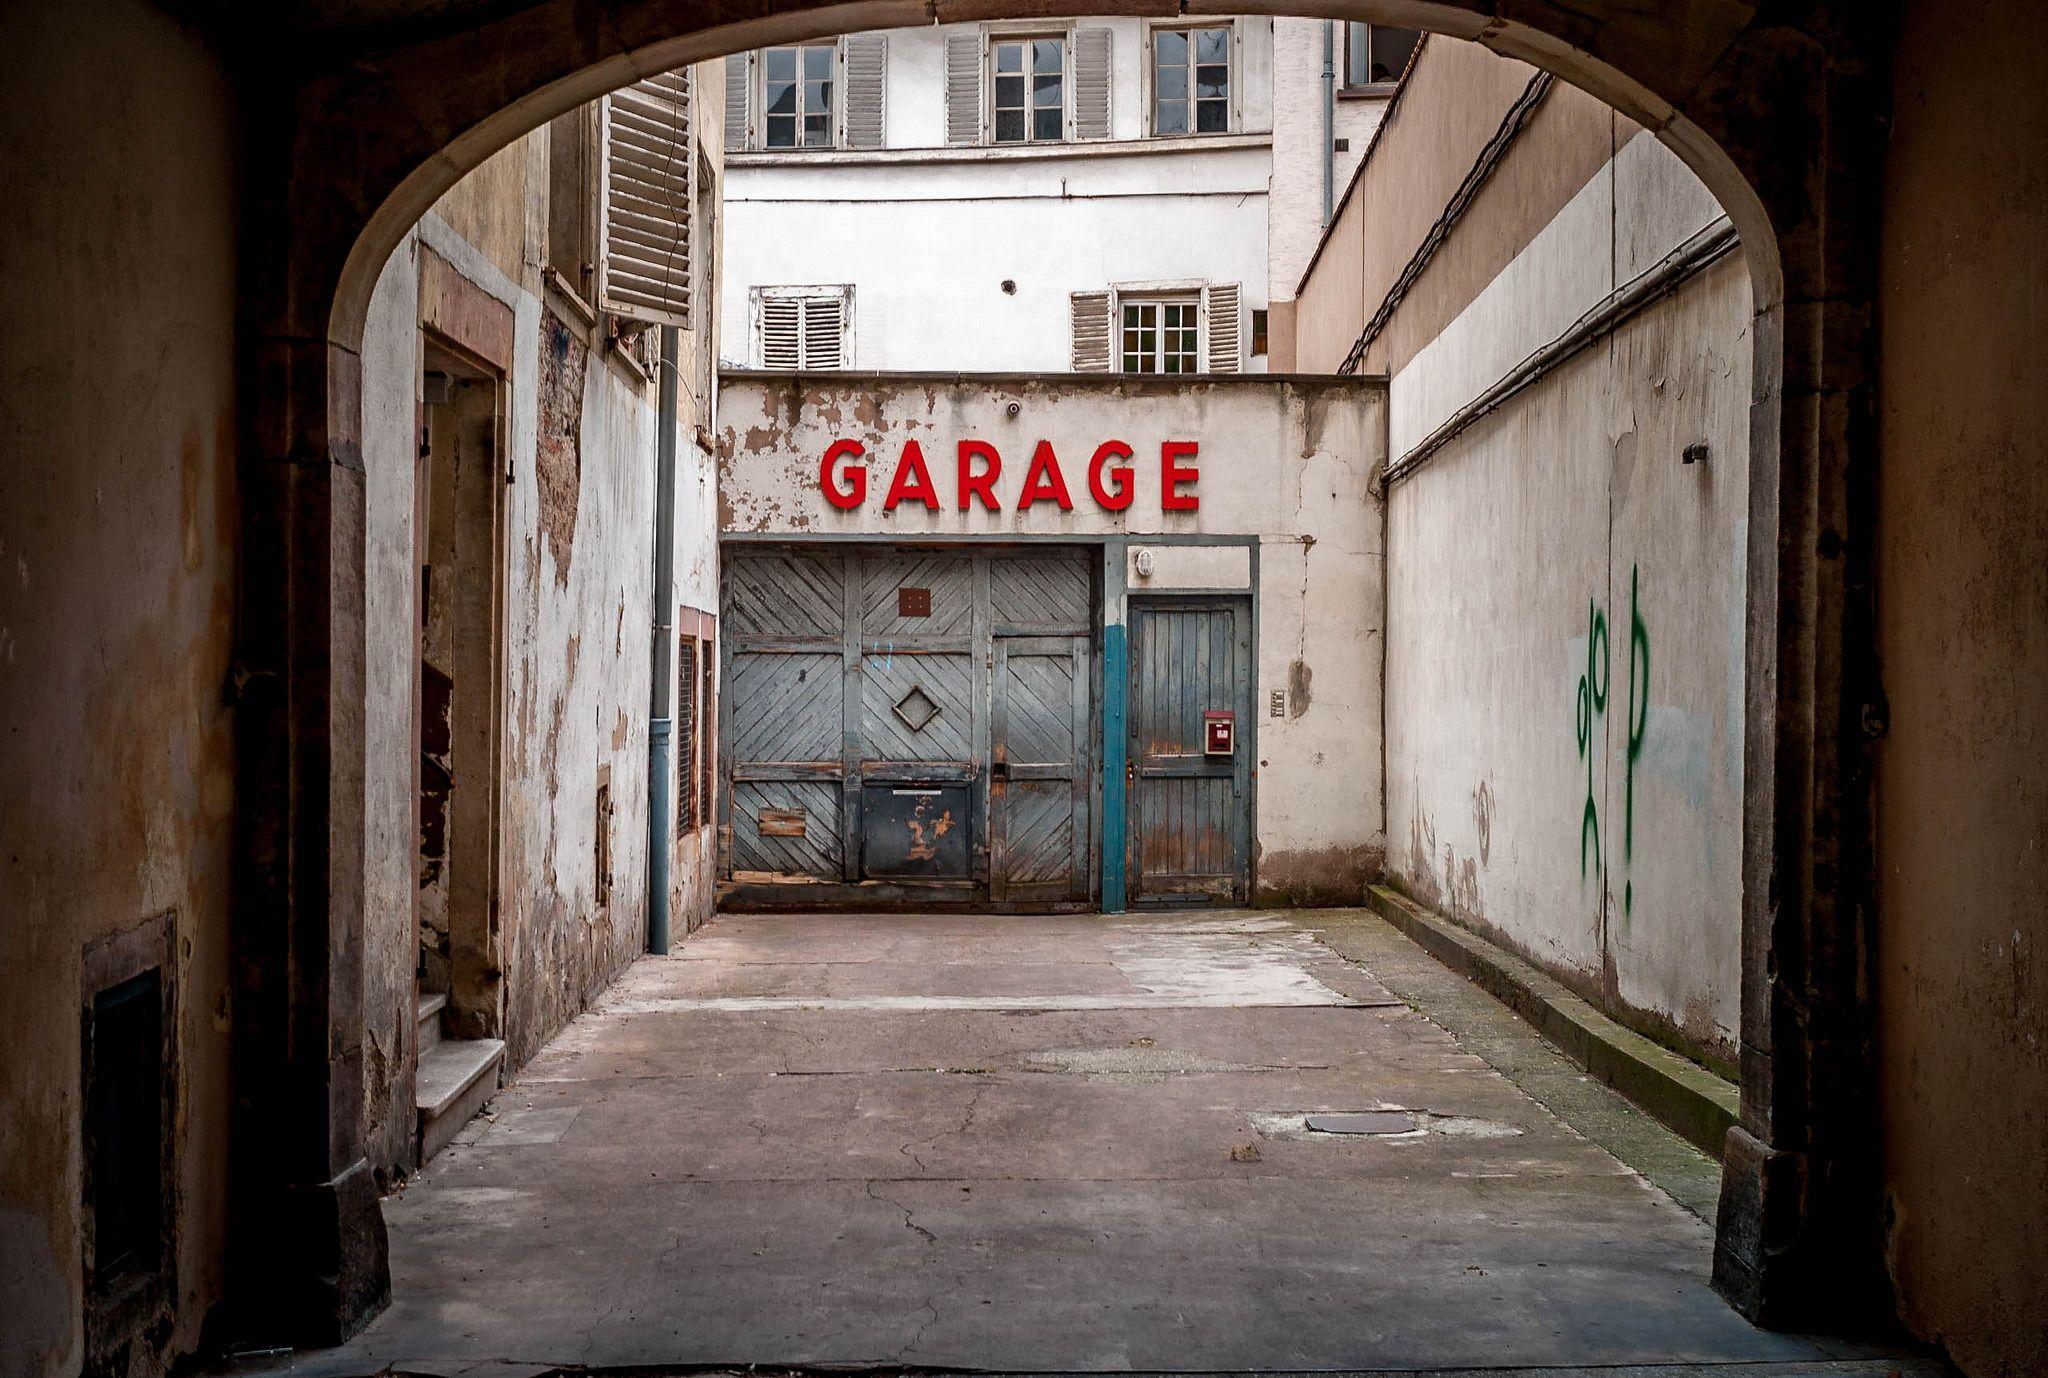 https://flic.kr/p/vS29Gk | LE garage | Leica M8, Summicron v IV